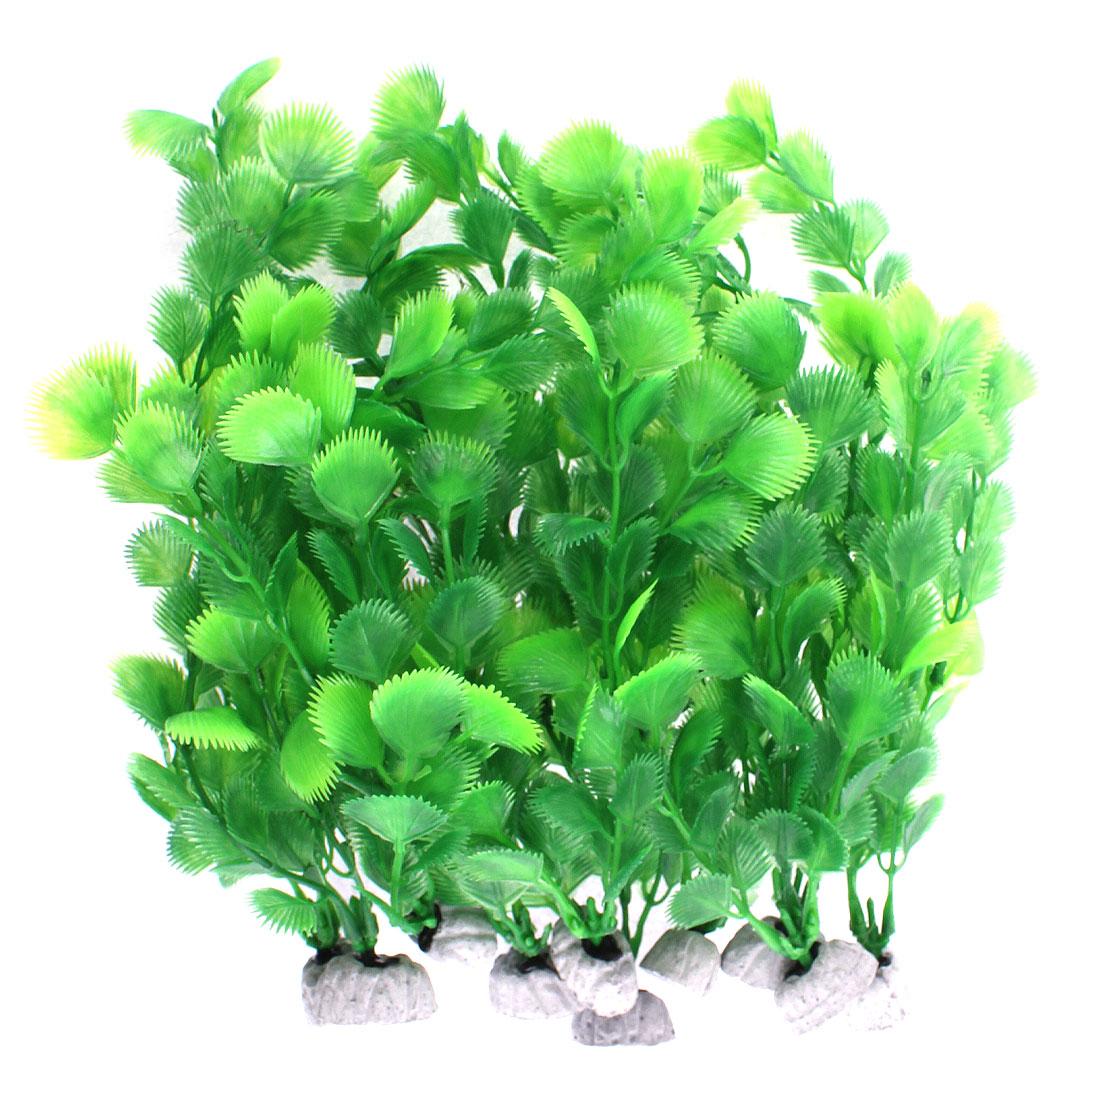 Plastic Manmade Water Plant Grass Green 25cm Height 10pcs for Aquarium